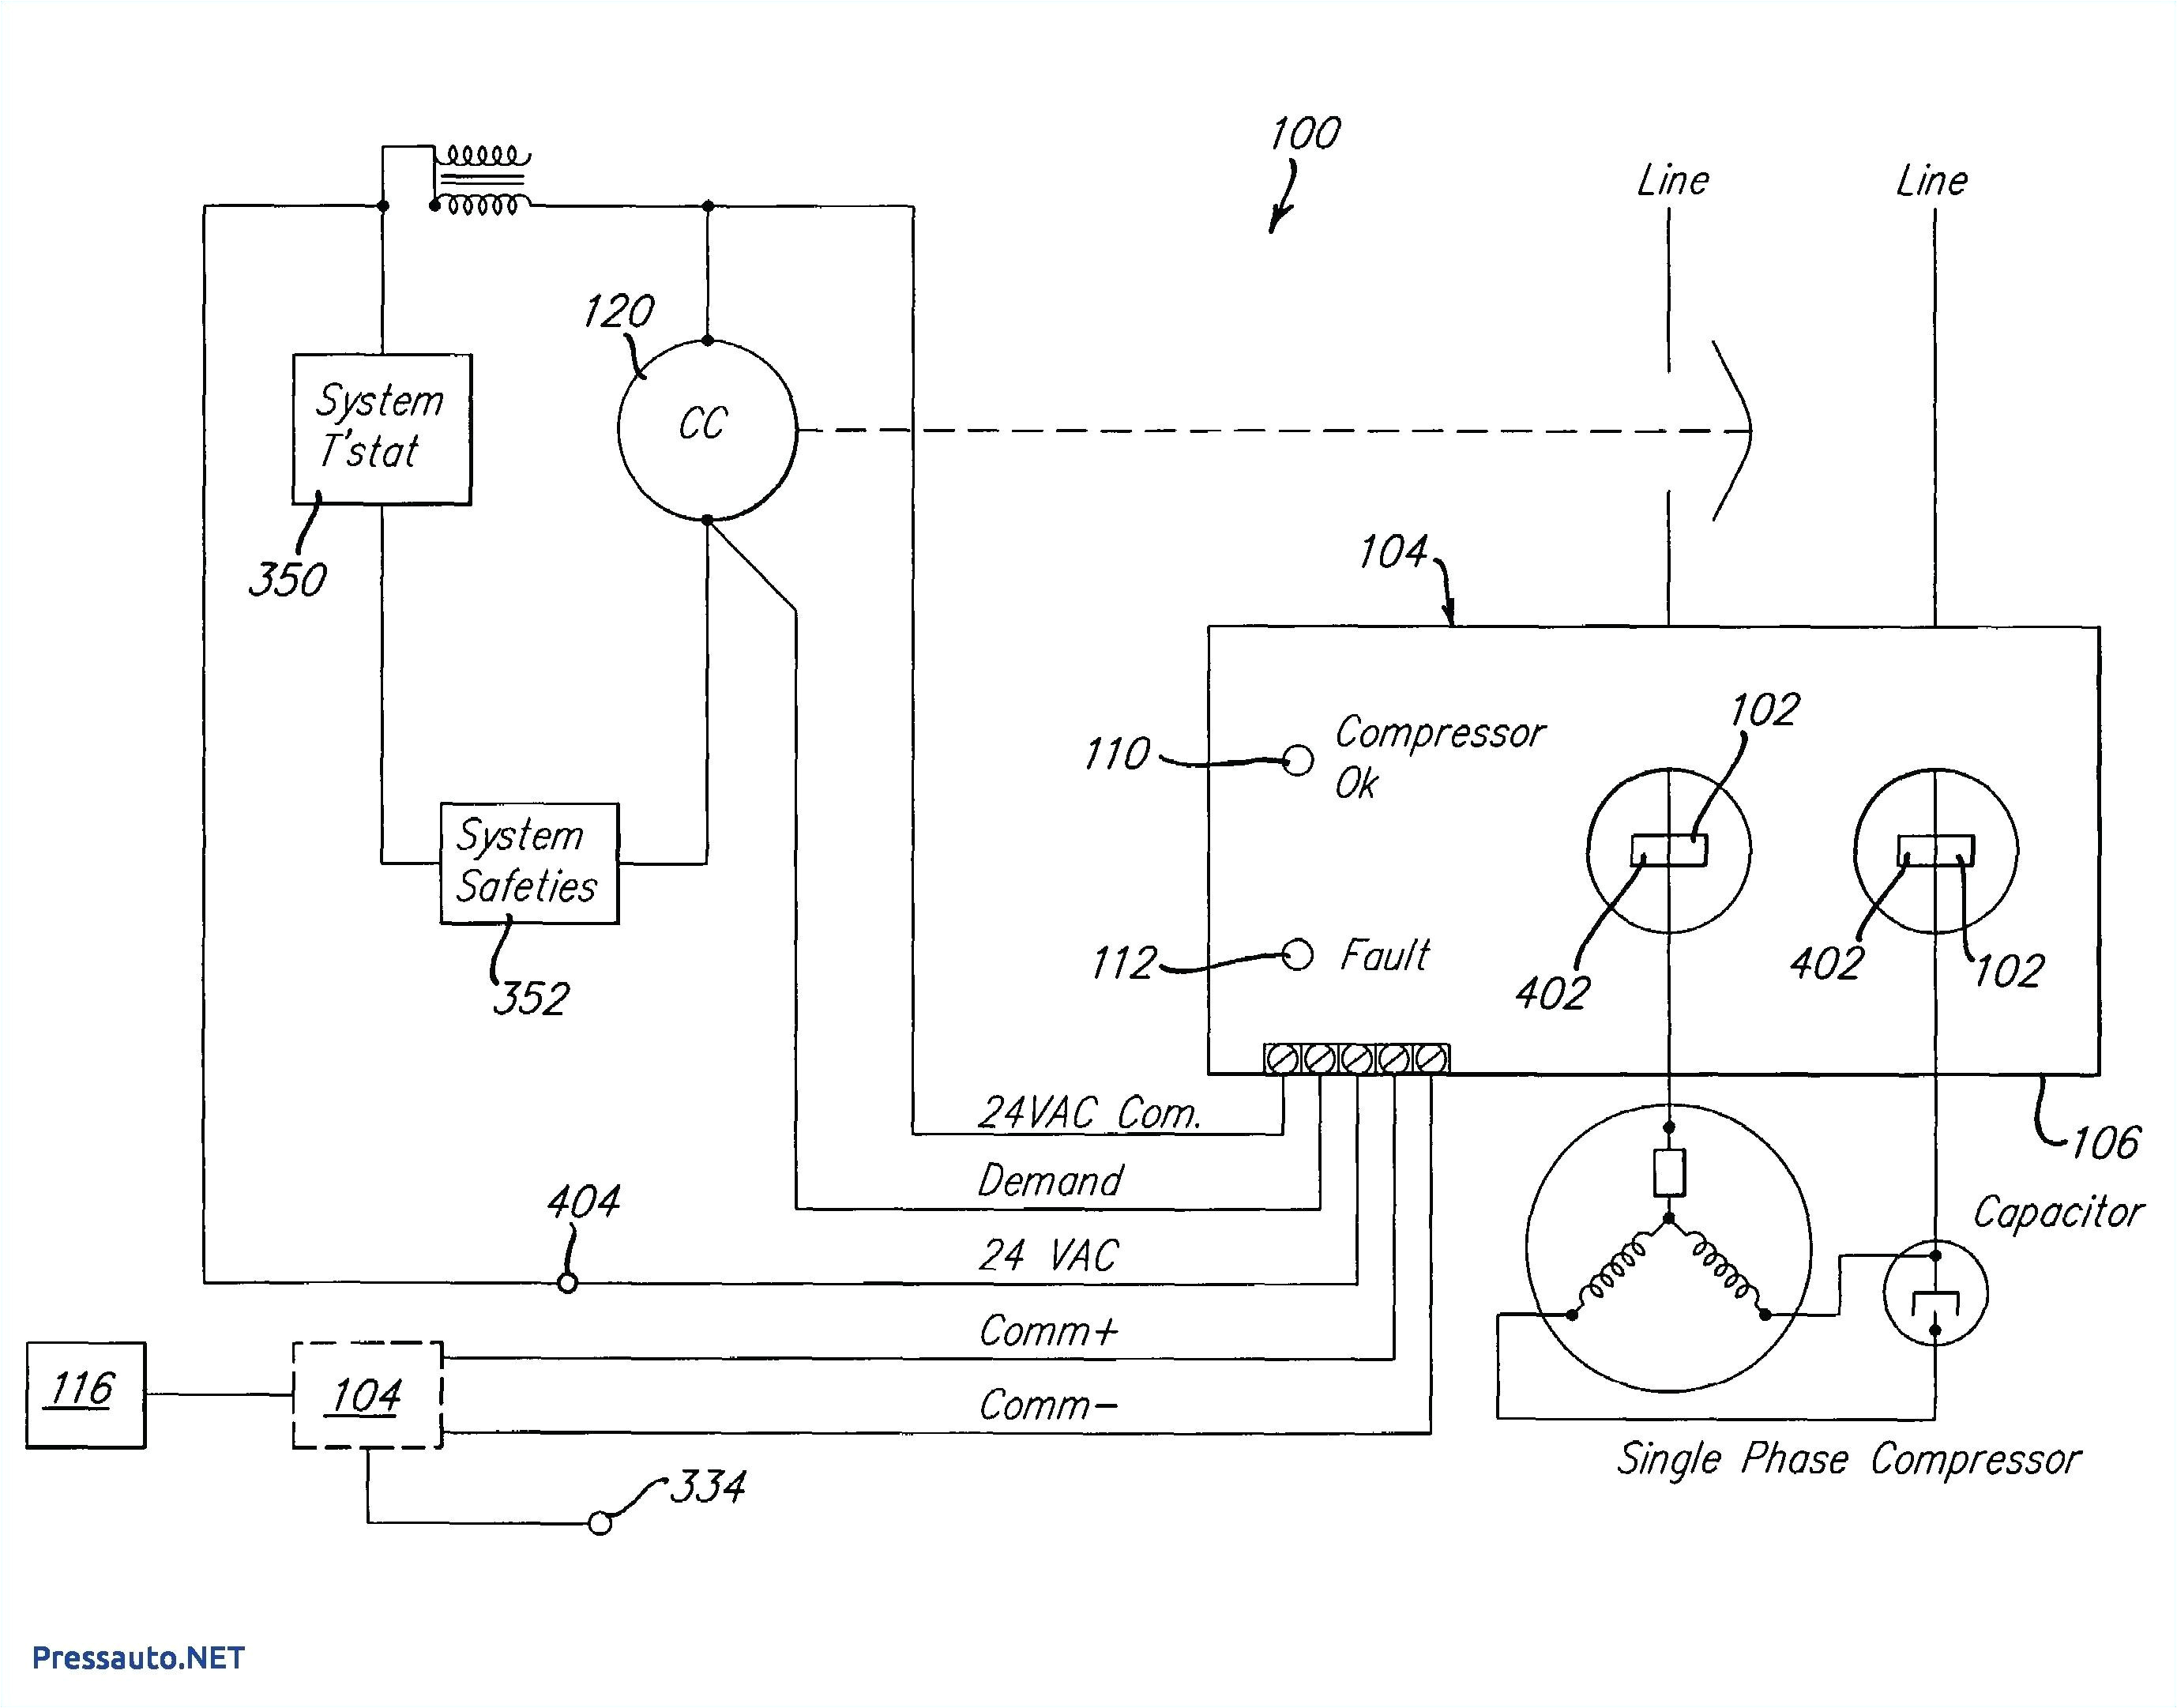 wiring copeland diagram cr32k6r pfv 875 wiring diagram files mix wiring copeland diagram cr32k6r pfv 875